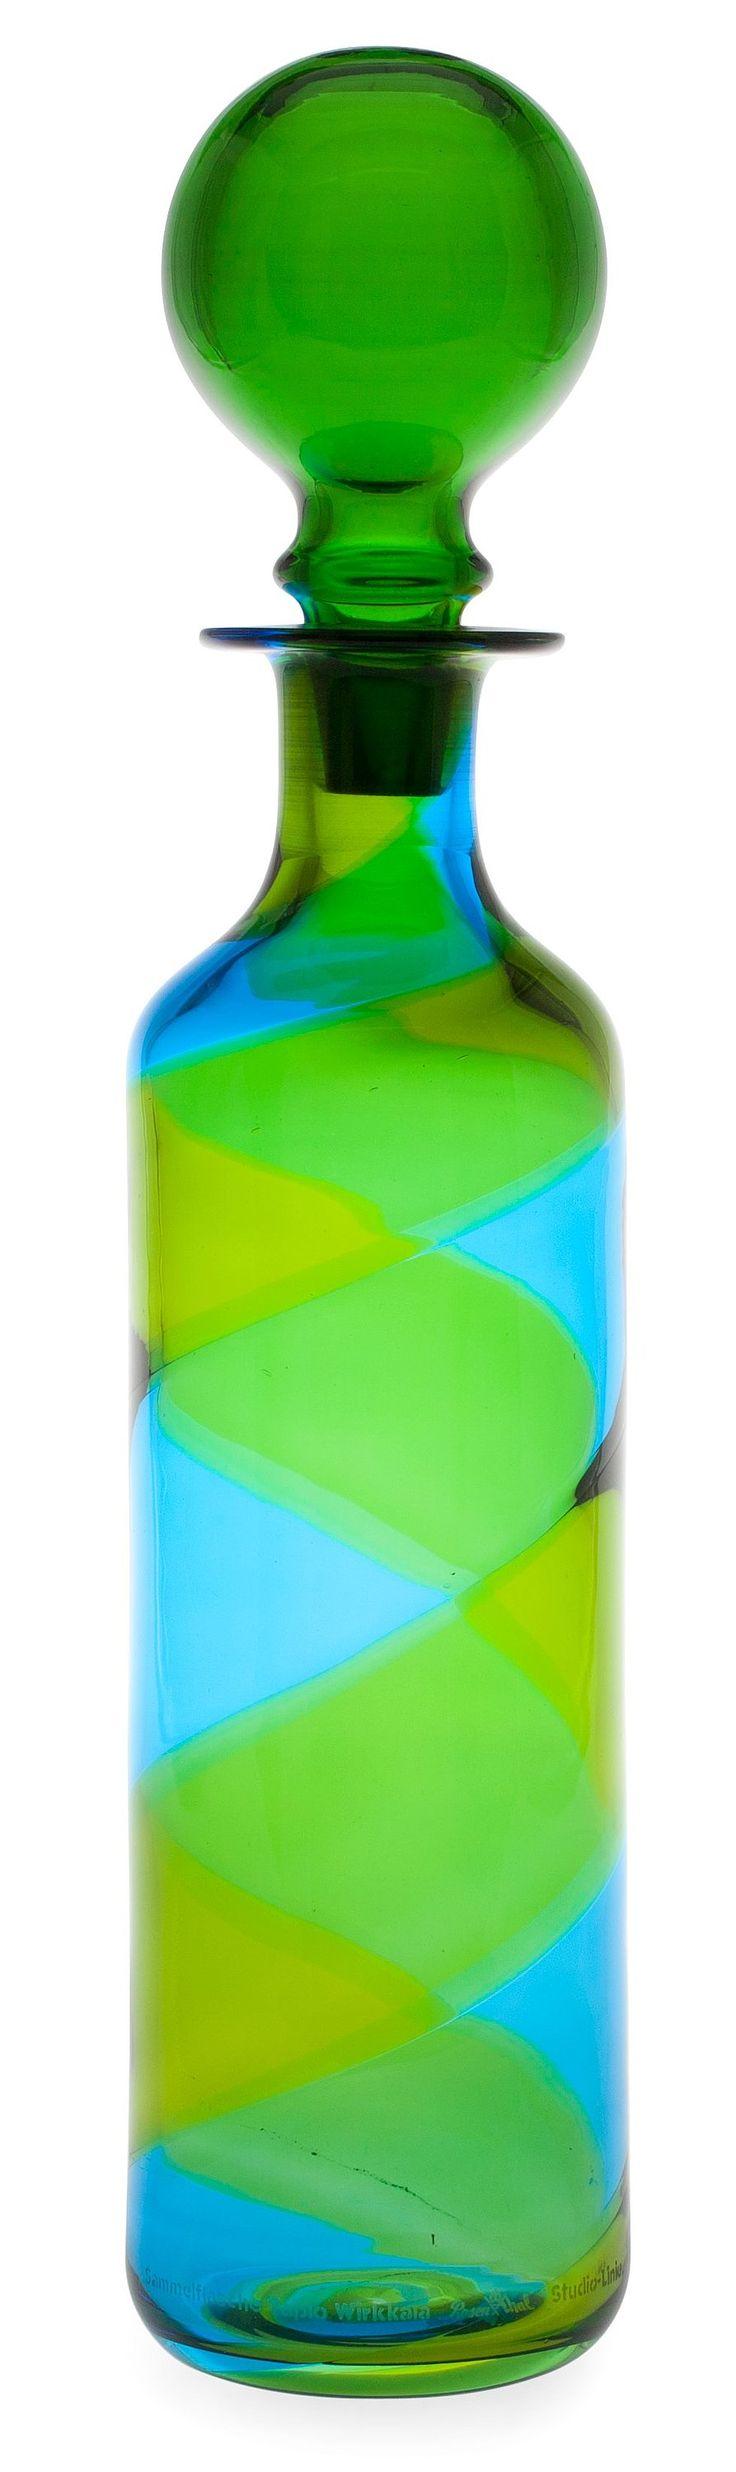 TAPIO WIRKKALA #GlassILove